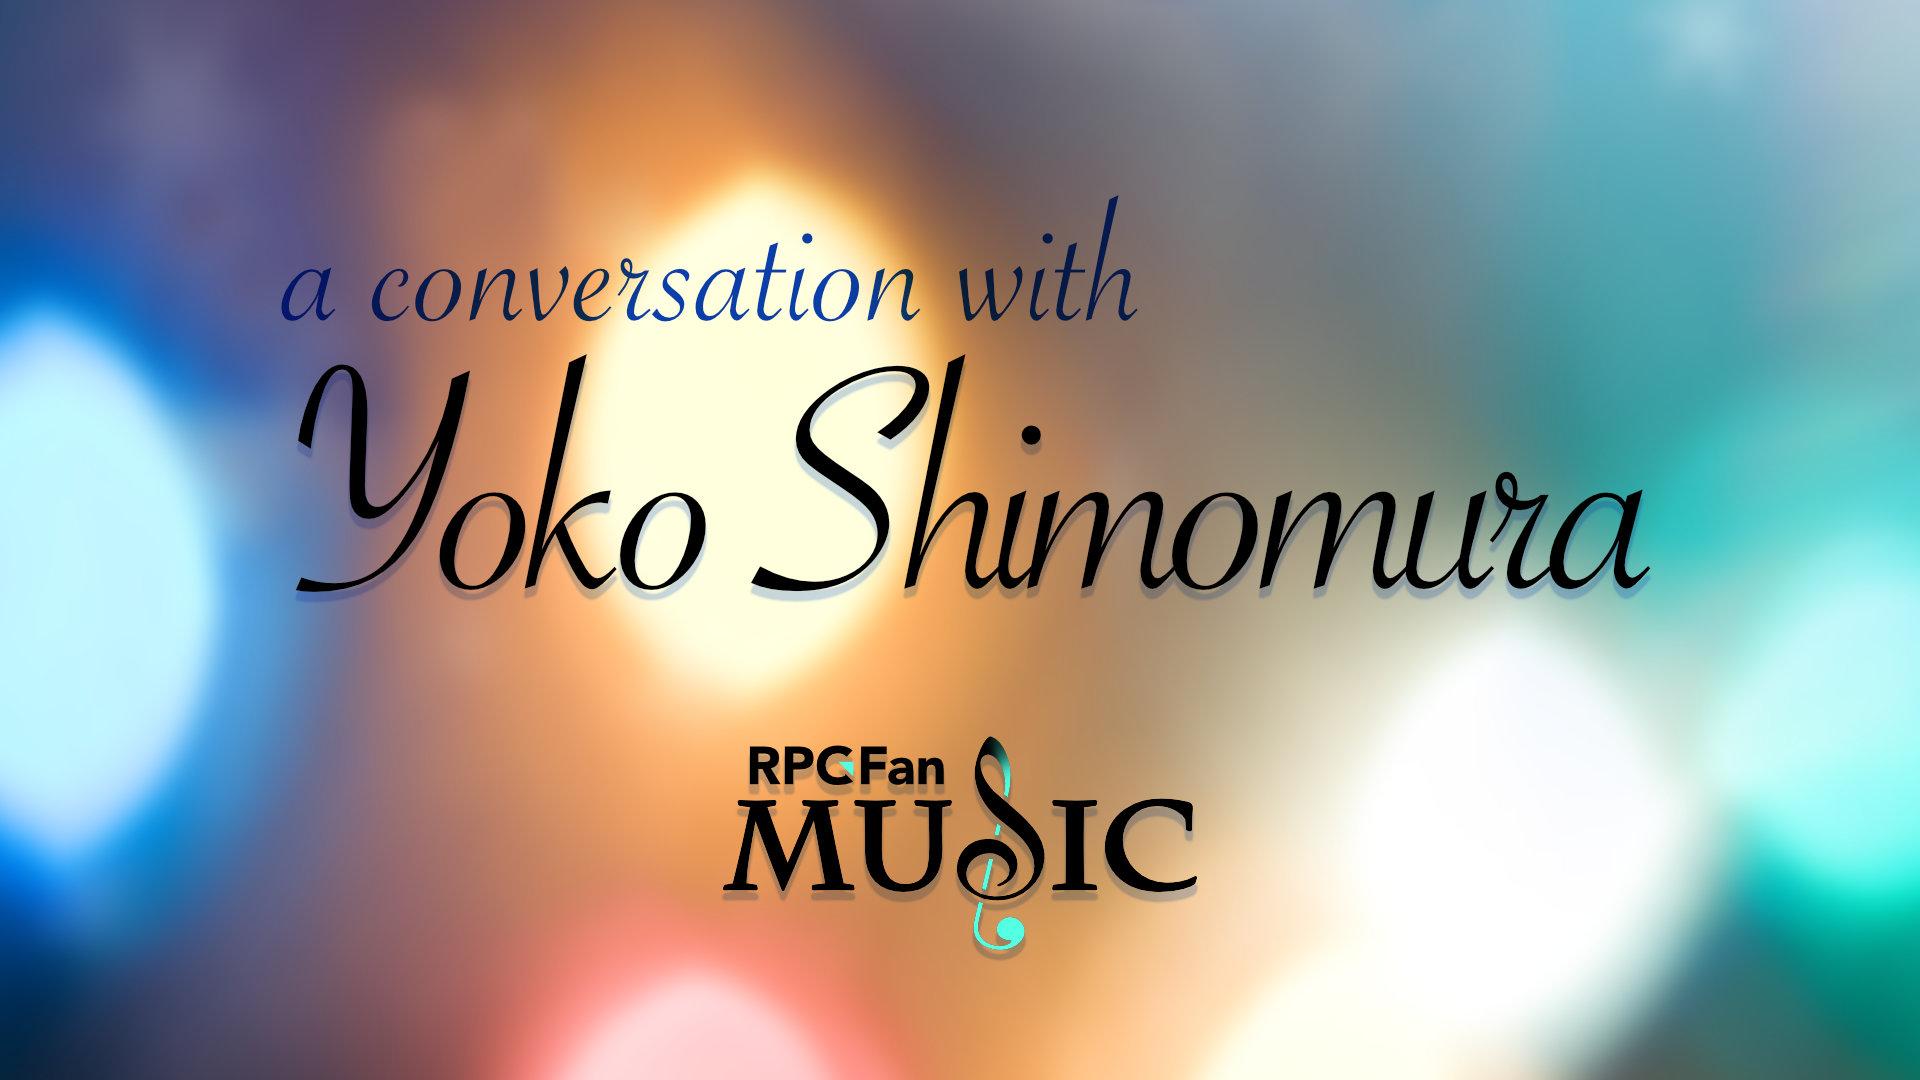 Yoko Shimomura Interview Featured